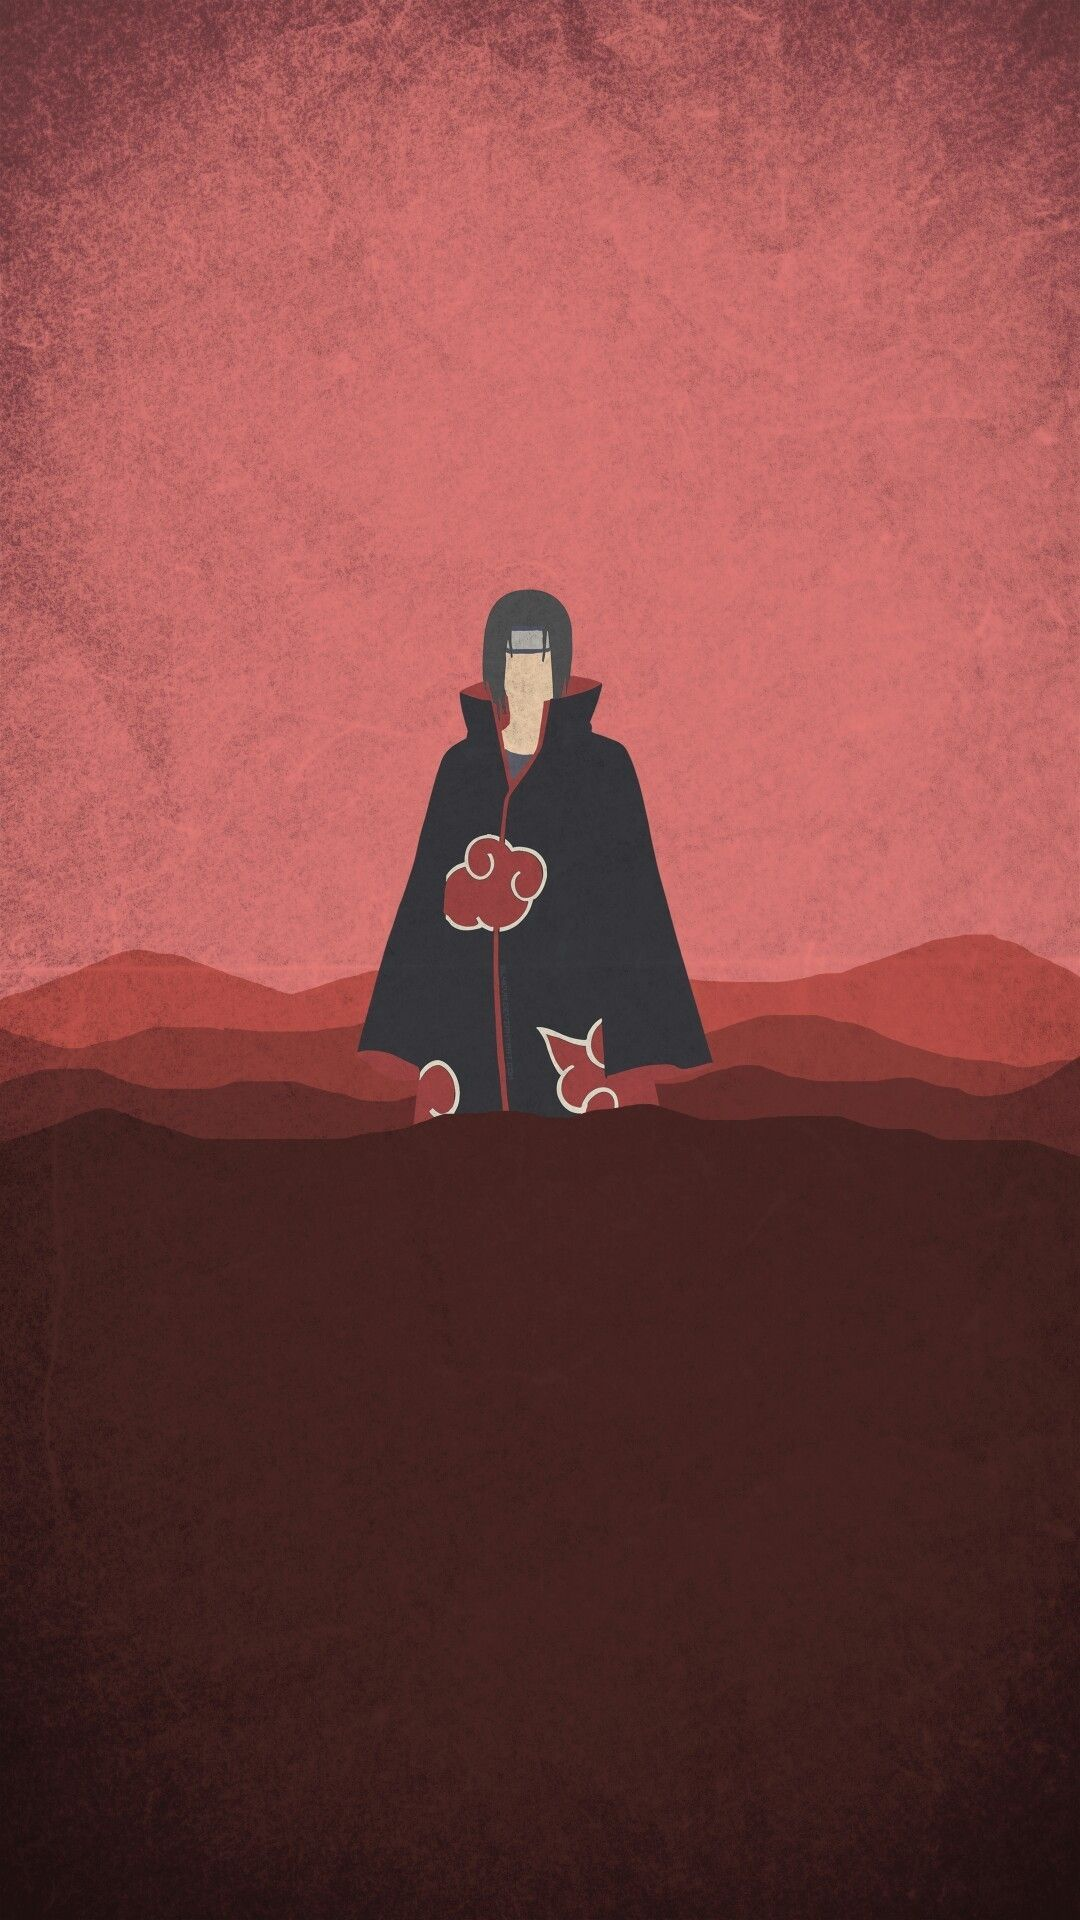 Pin by ninetyeight on anime | Wallpaper naruto shippuden ...